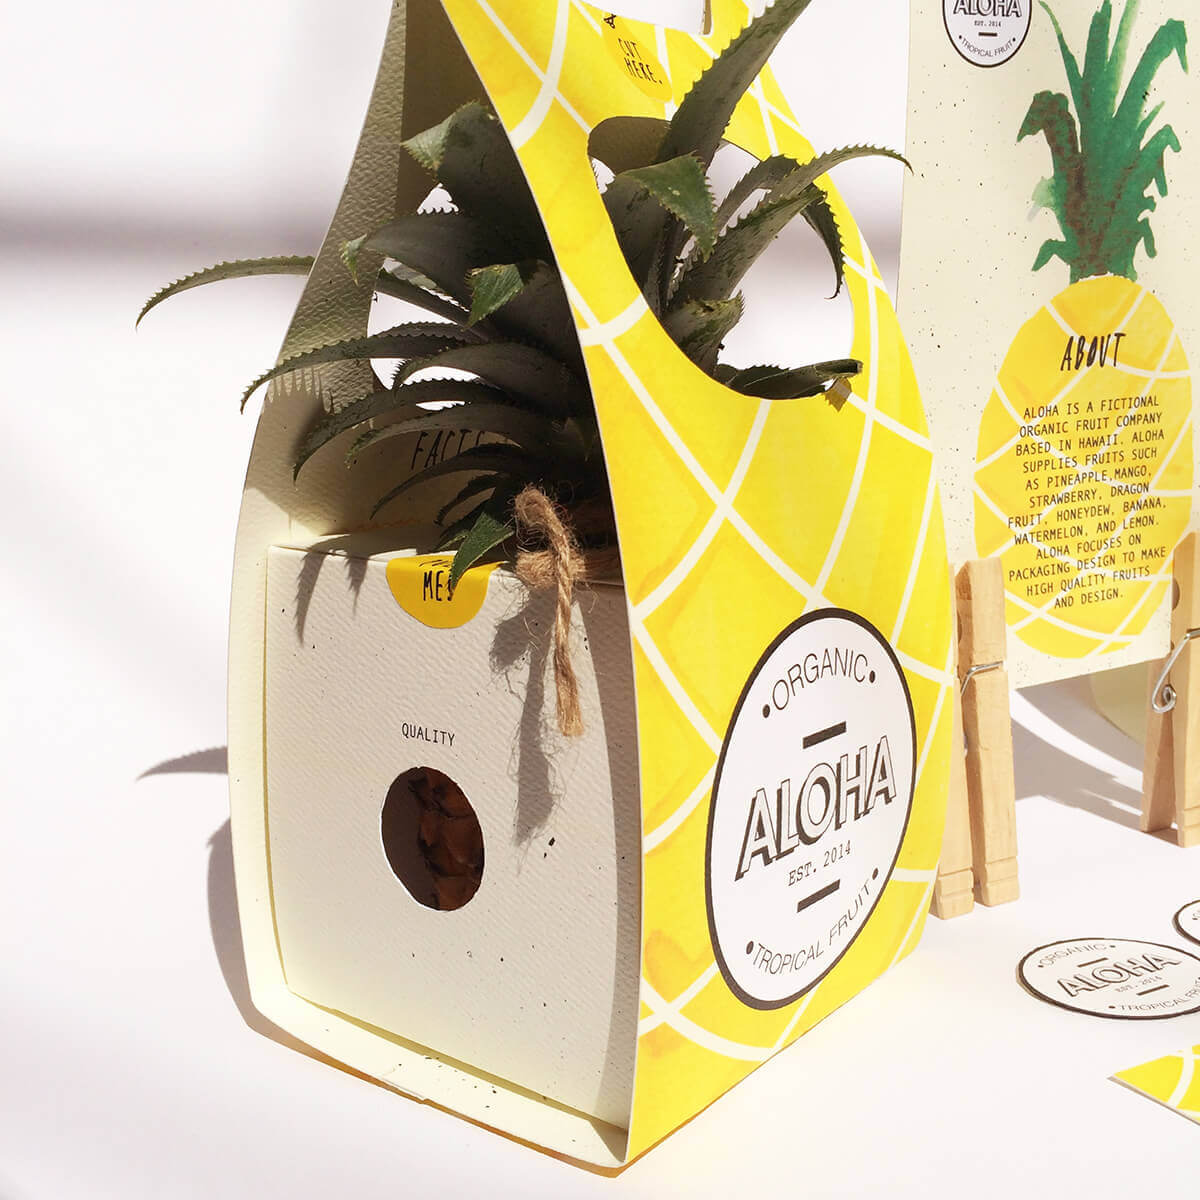 Packaging Ninette Saraswati ALOHA